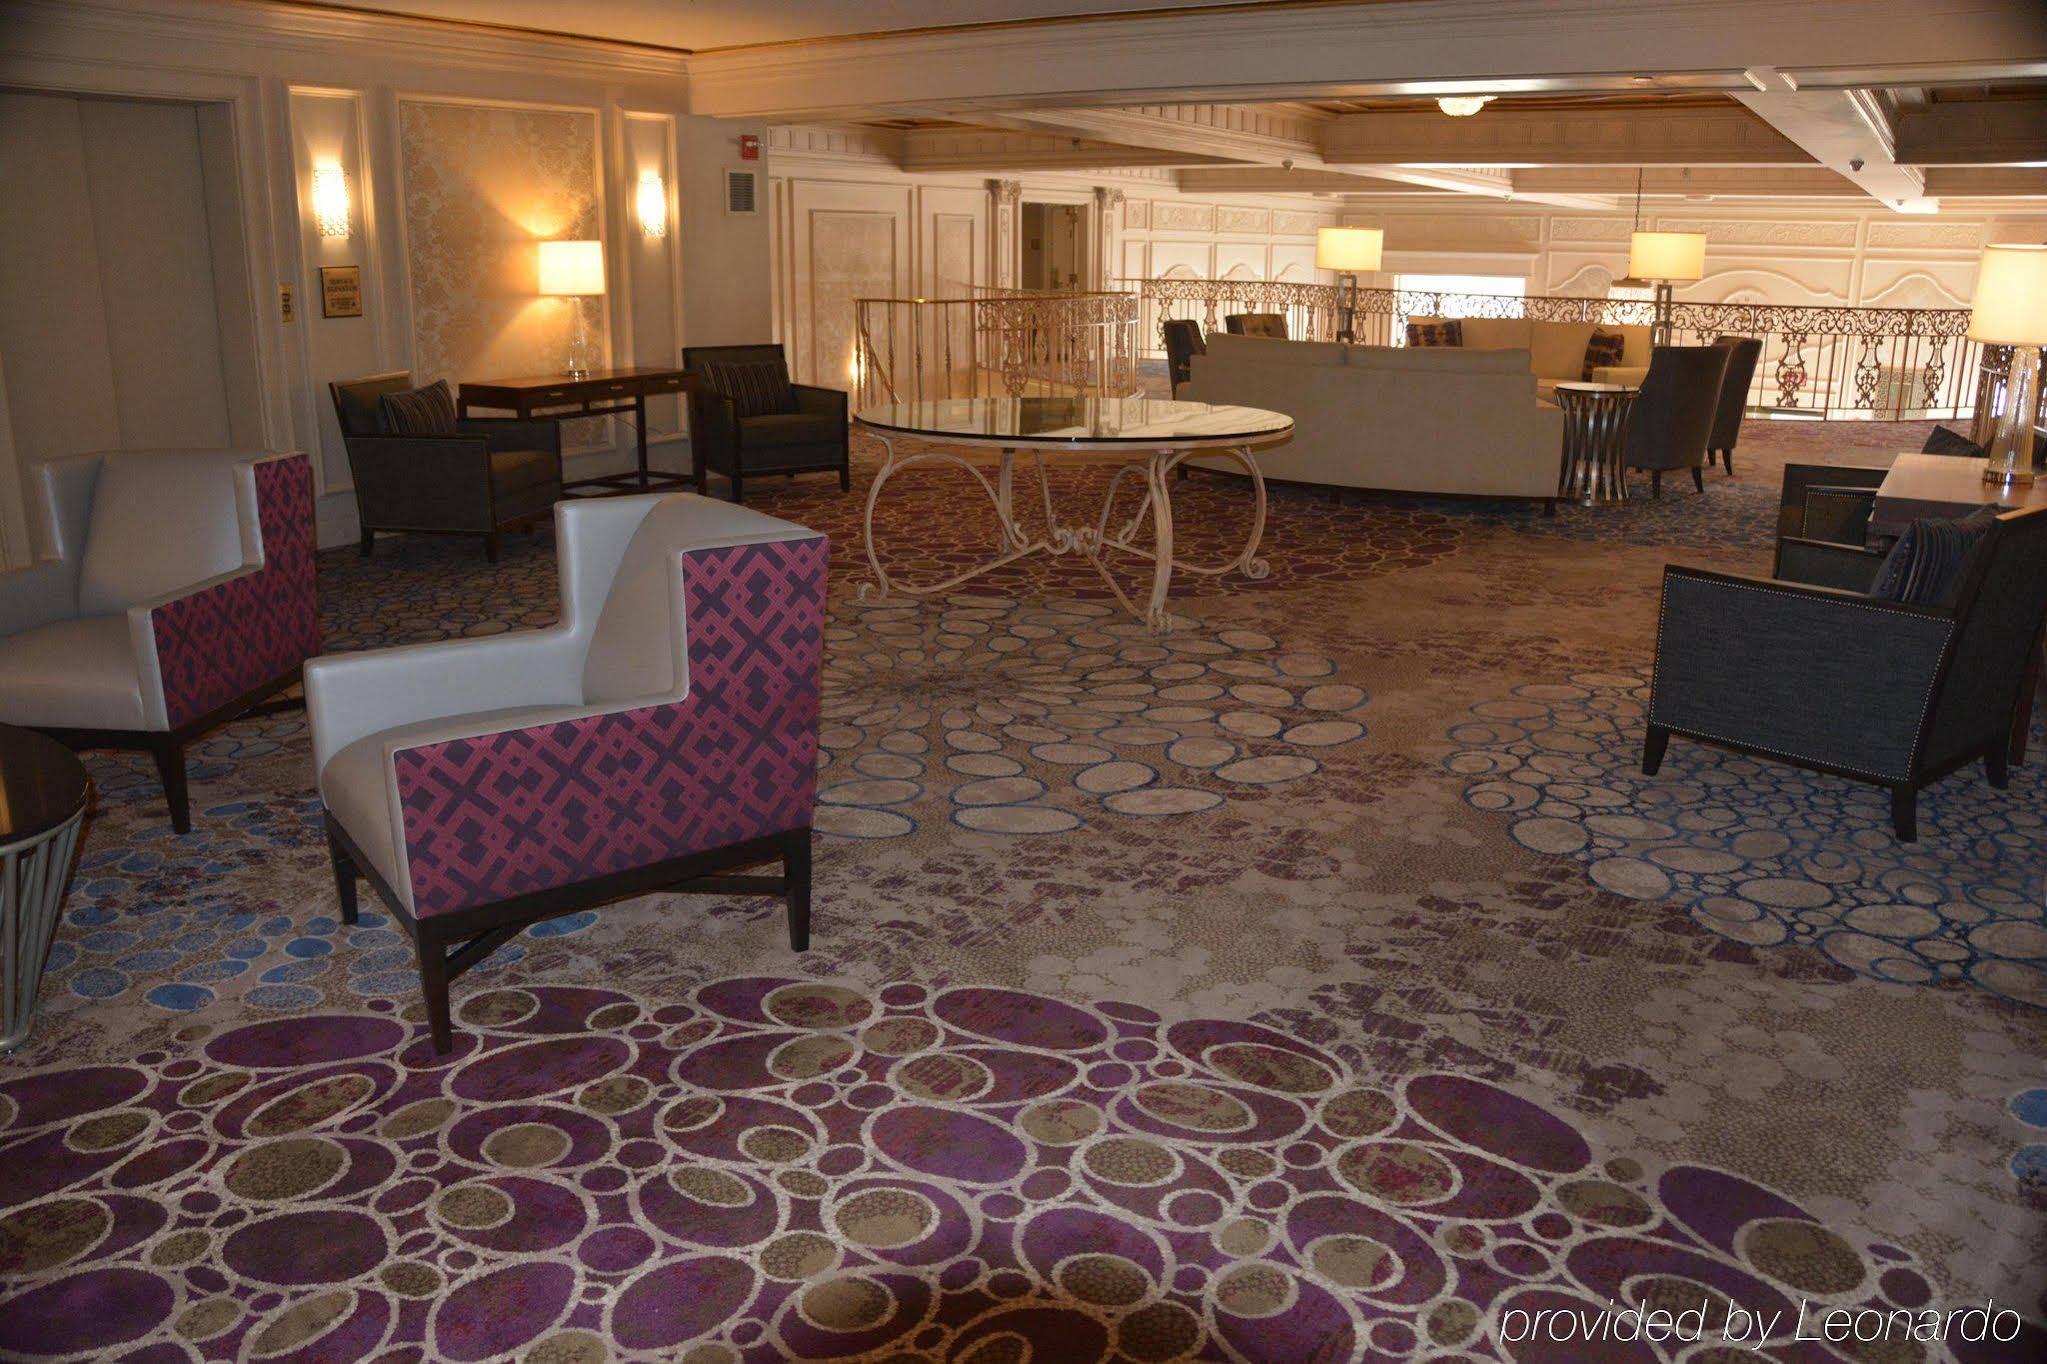 Hilton St. Louis Frontenac